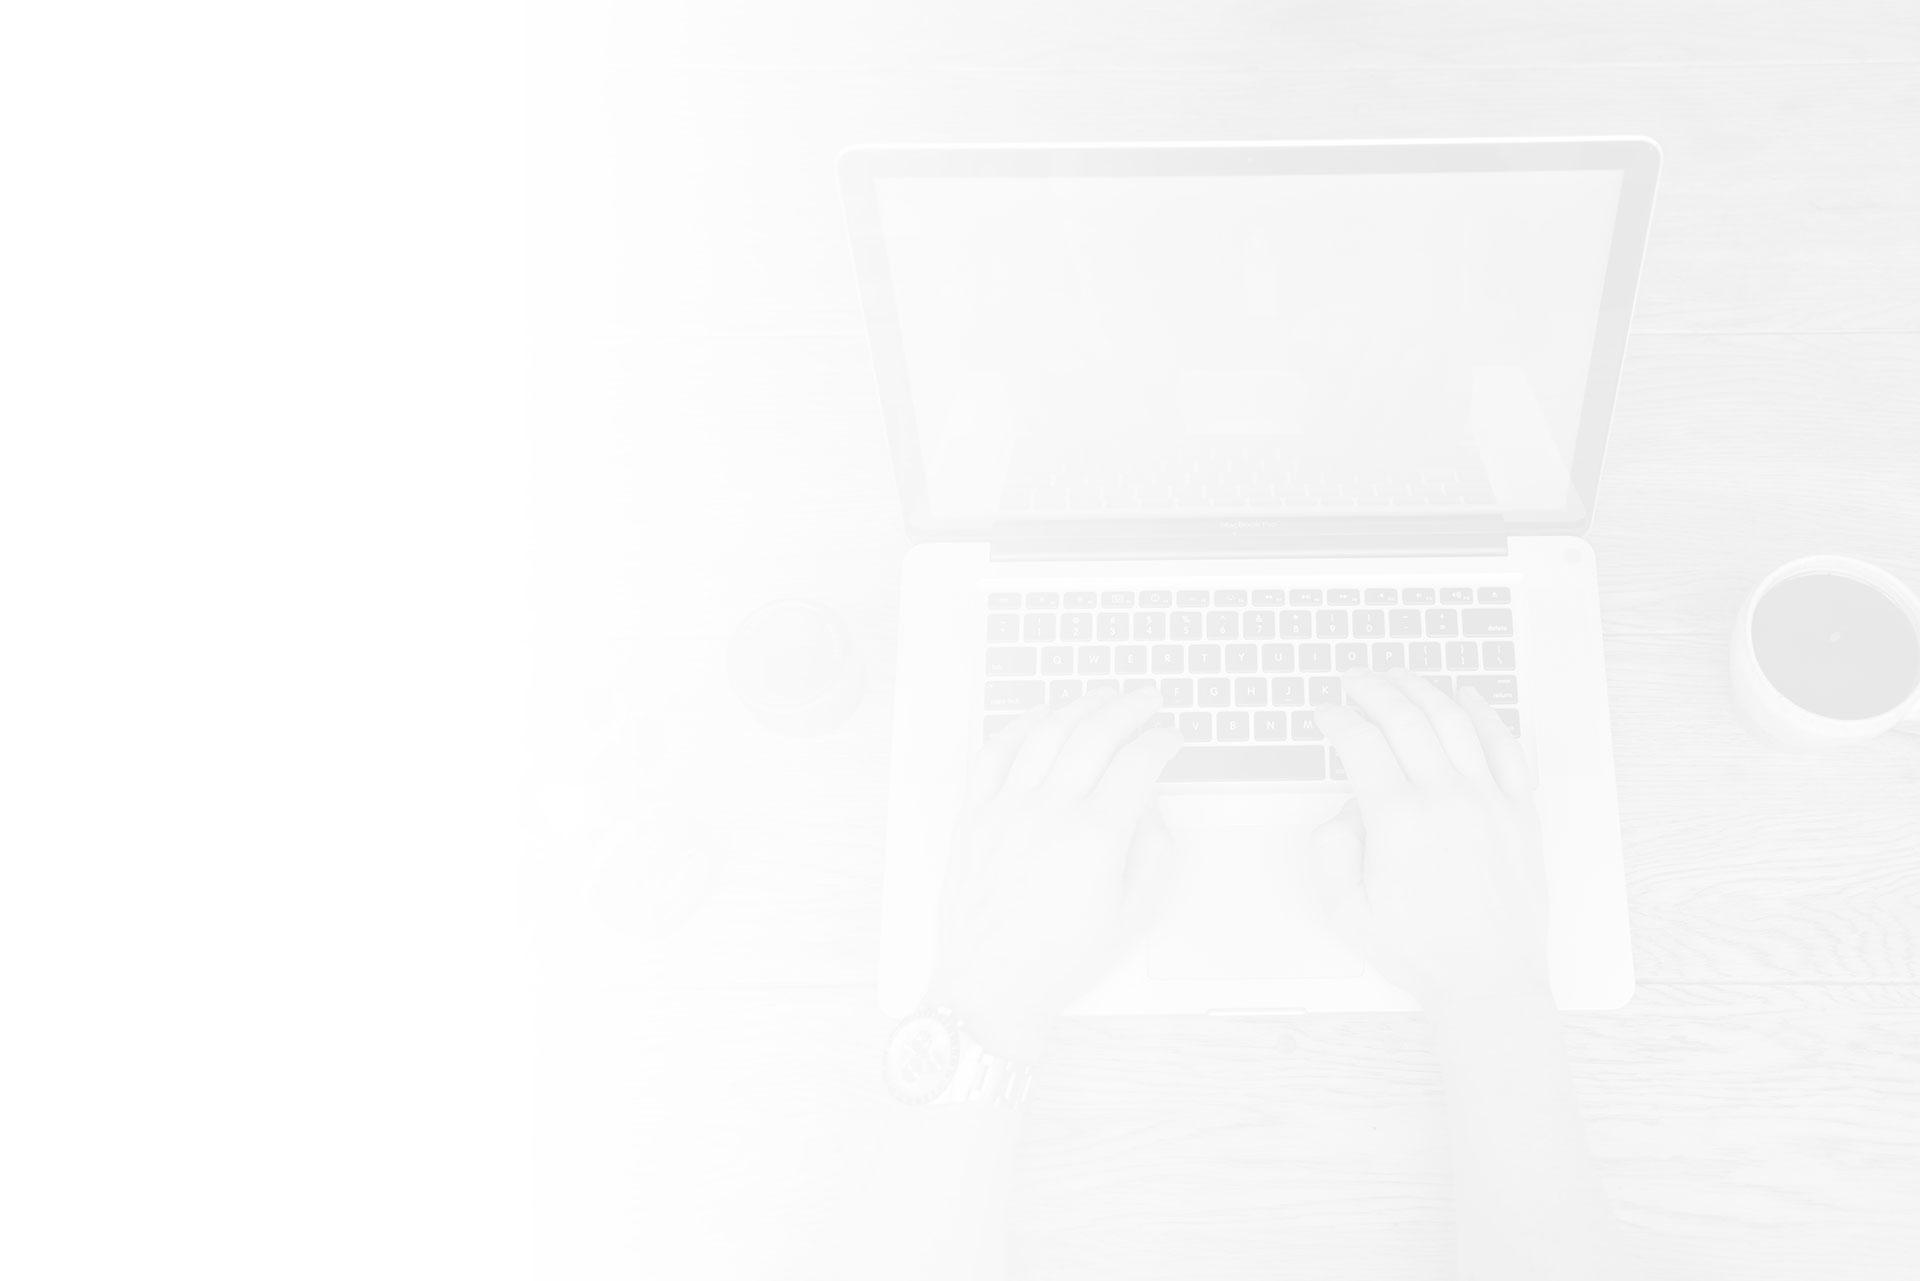 we built your website background